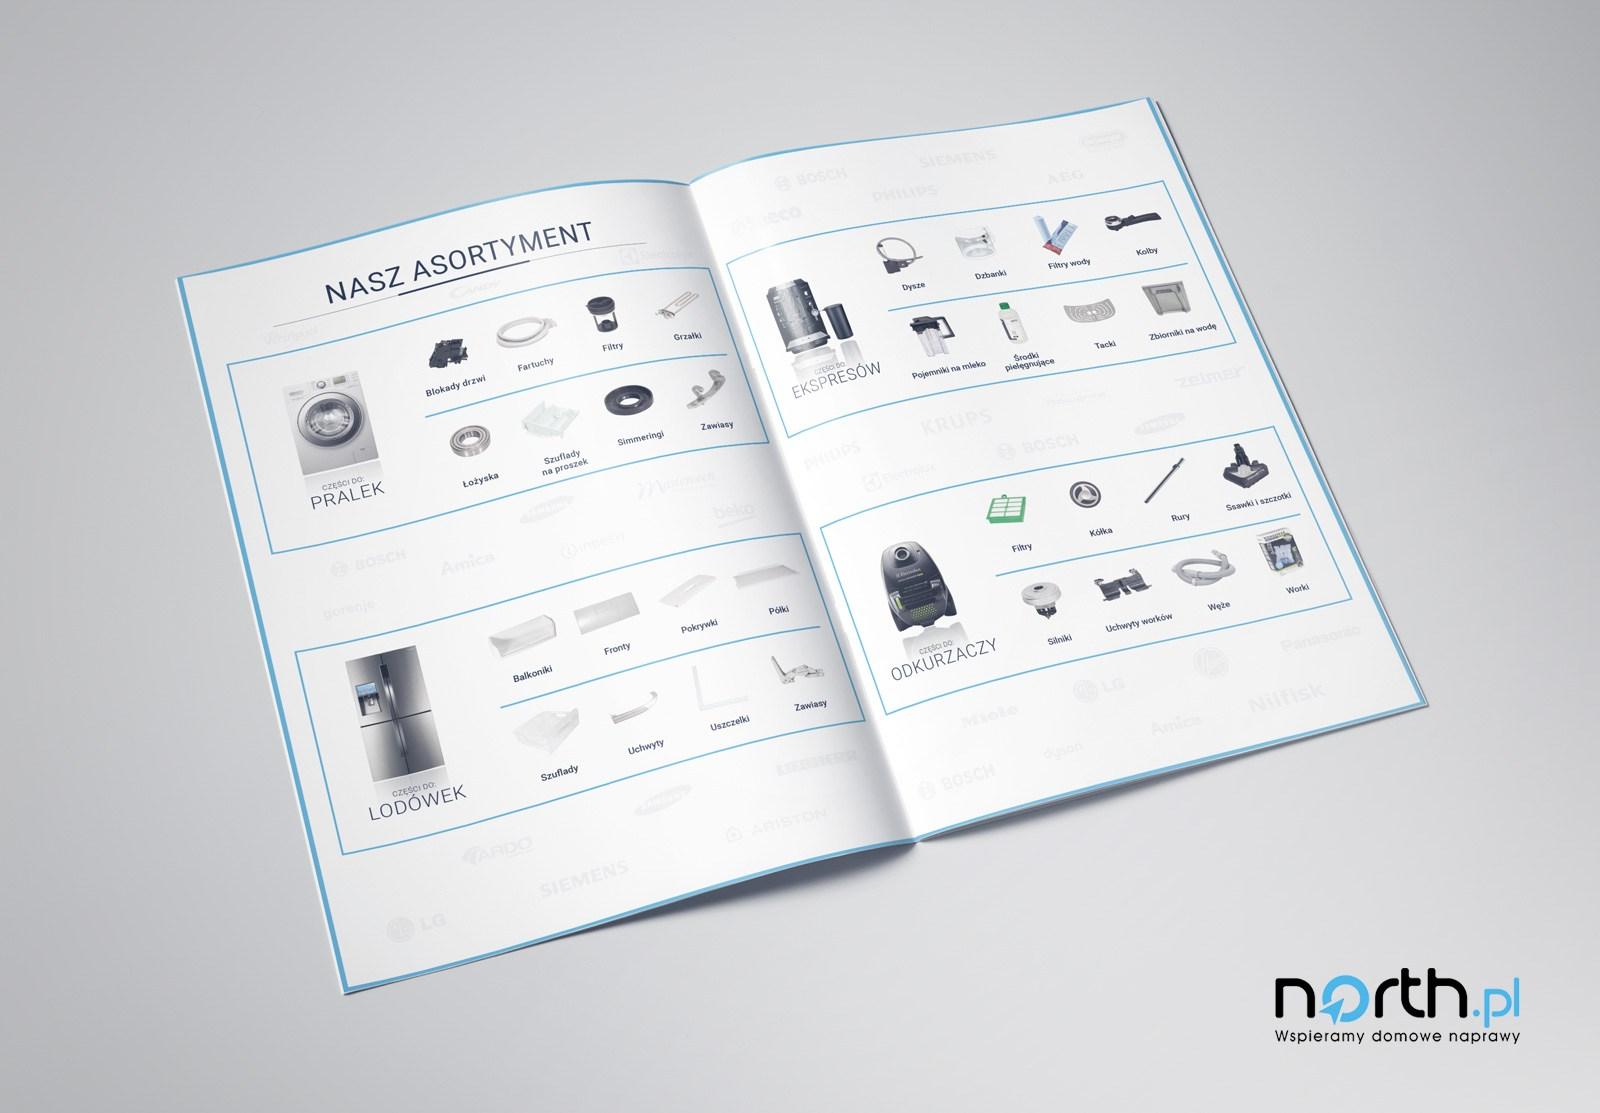 northpl-print-01-1600px